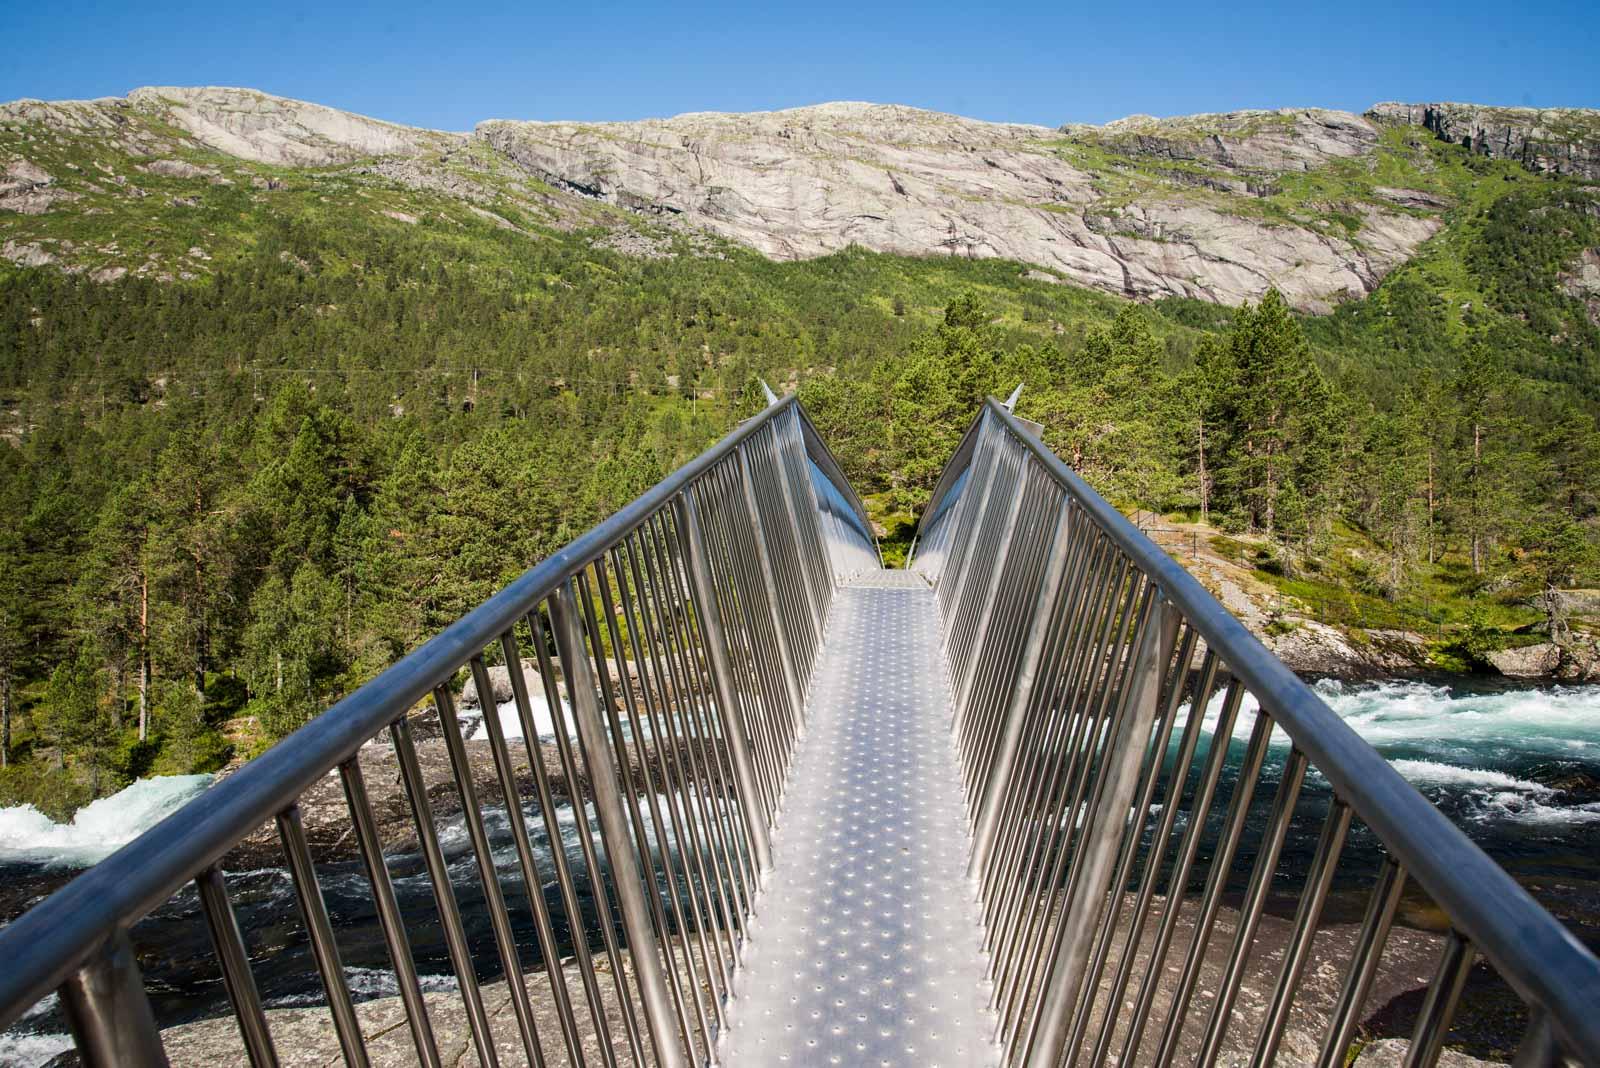 Gangbrua over Likholefossen